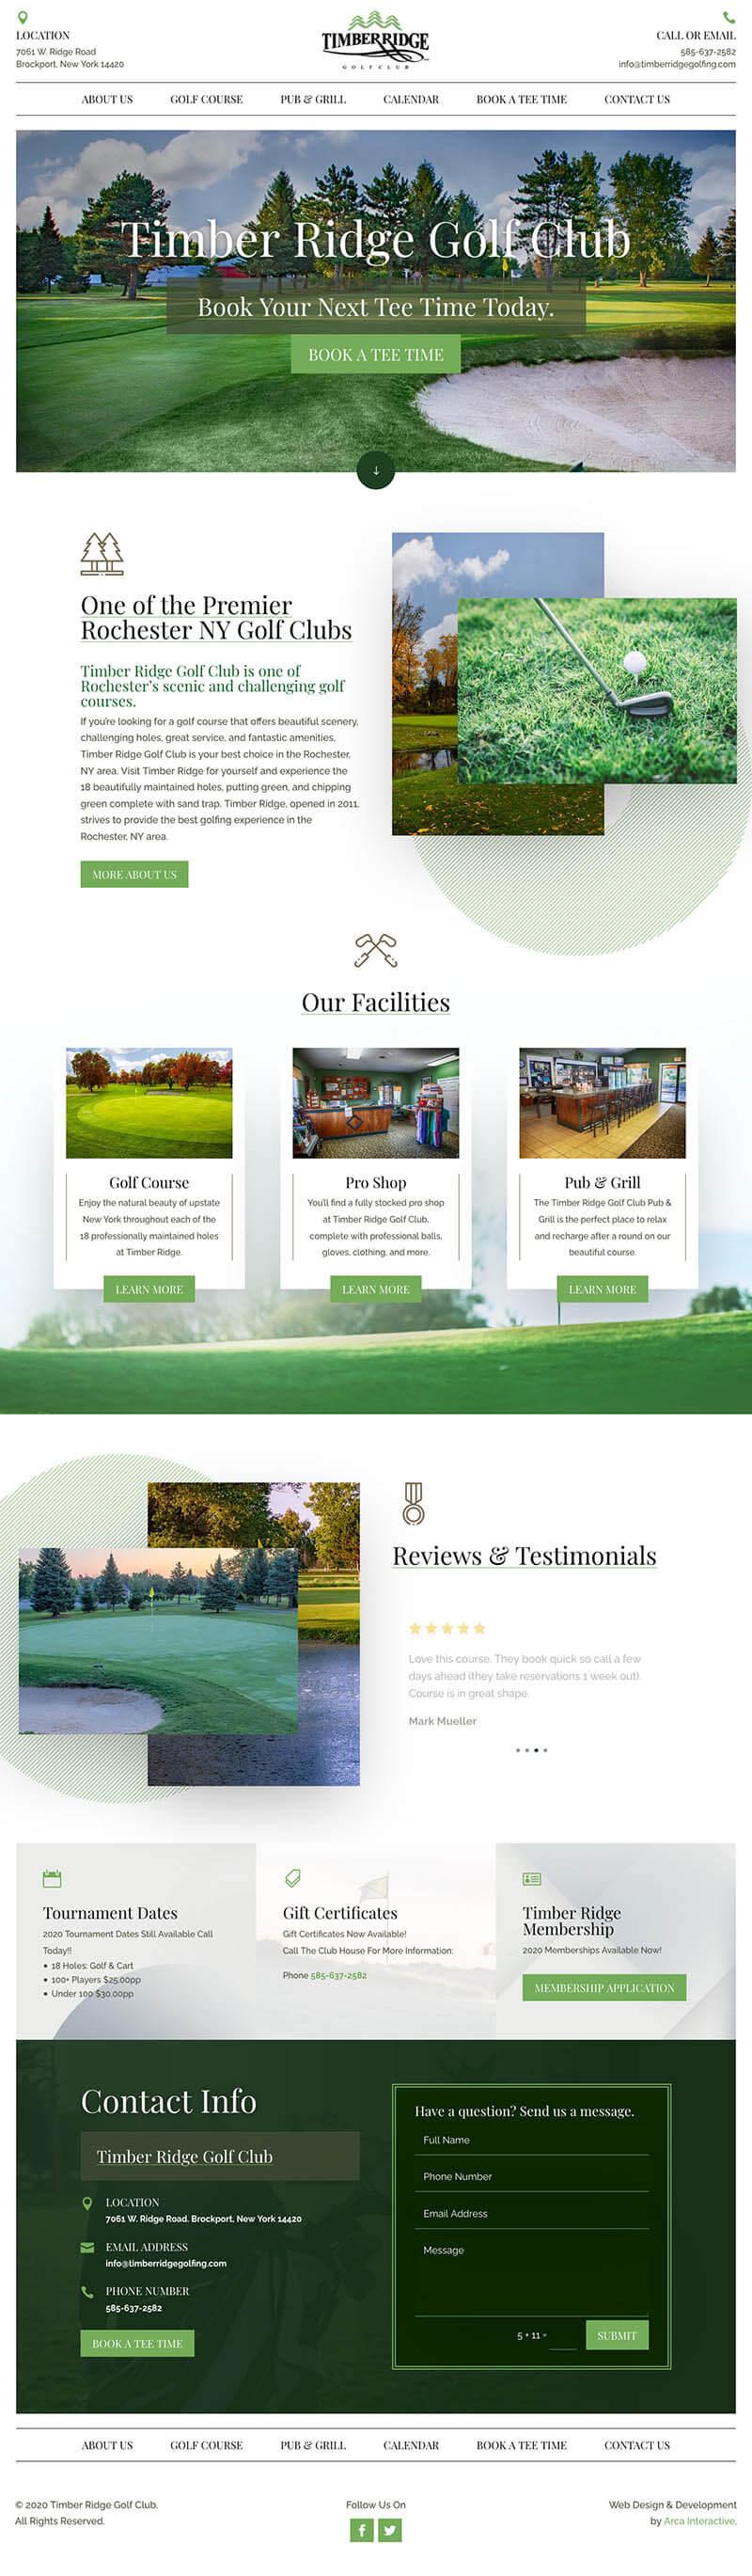 Timber Ridge Golf Web Design